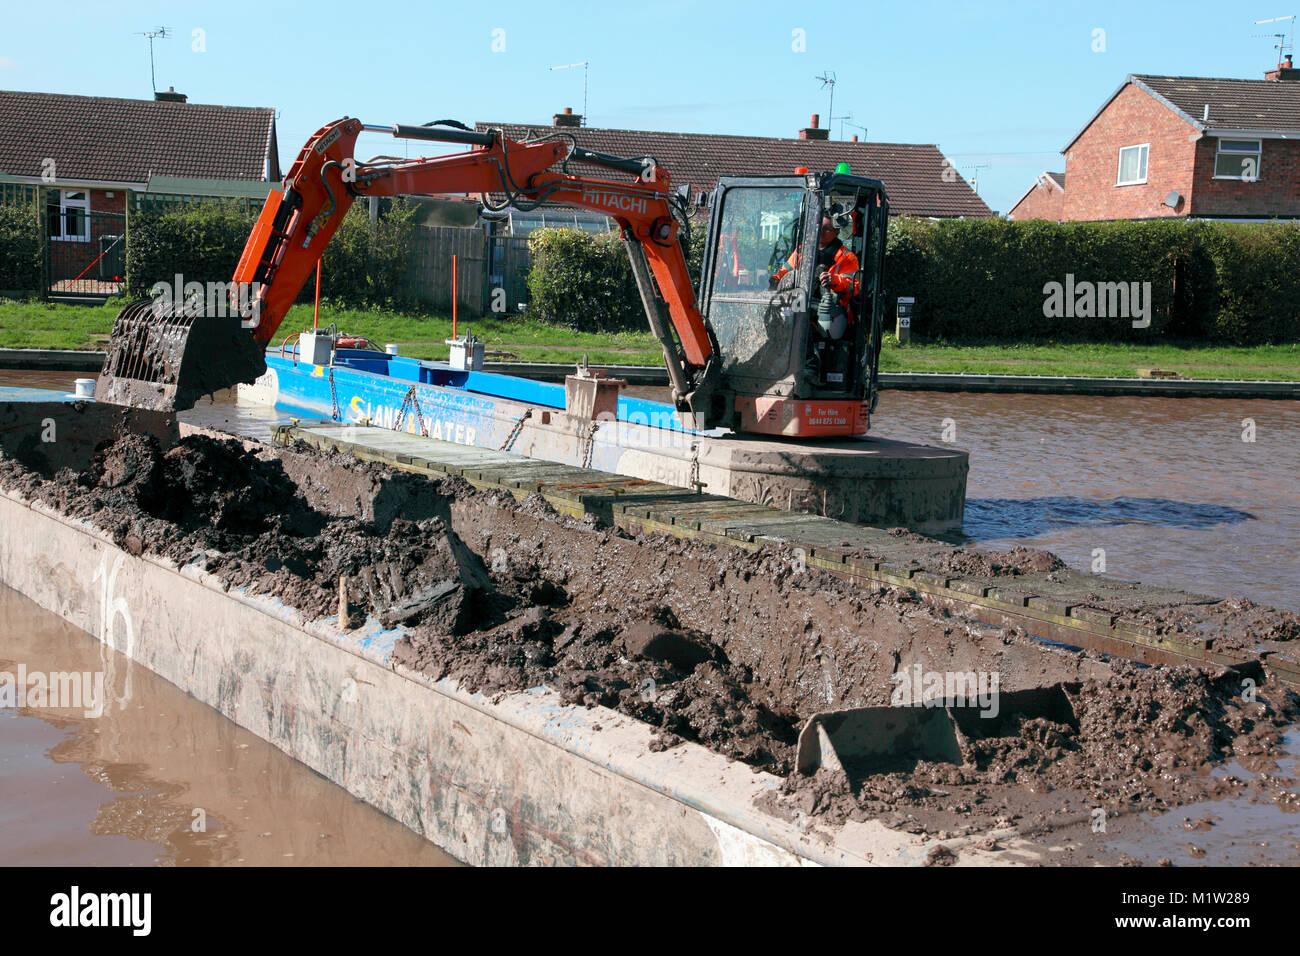 Dredging the Shropshire Union Canal at narrowboat moorings in Market Drayton Shropshire - Stock Image